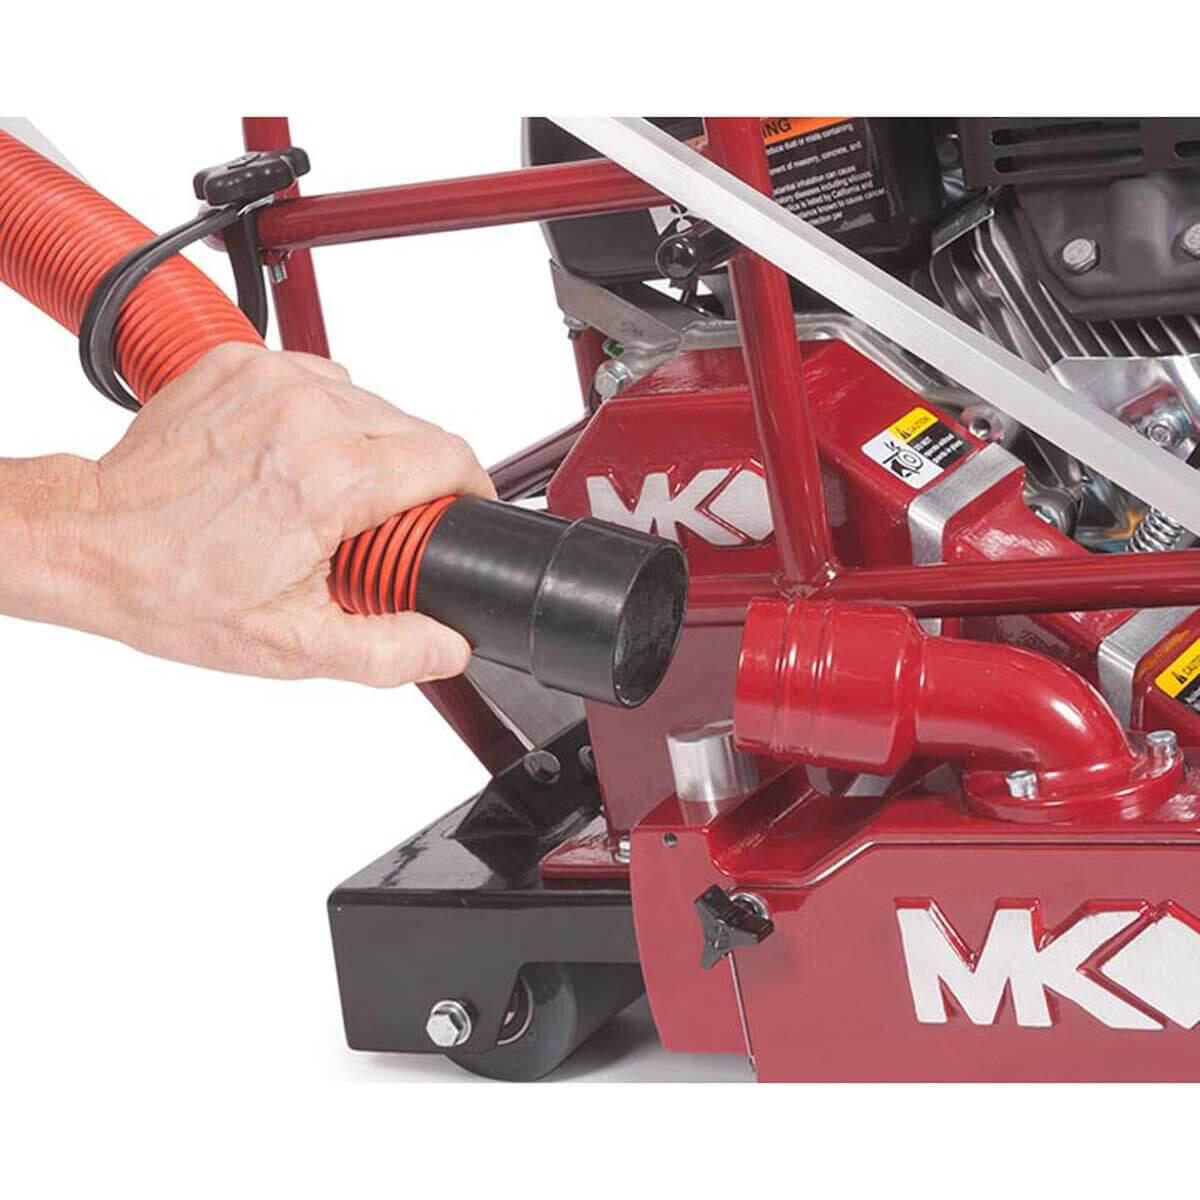 MK Diamond SRX-150 Saw Vacuum Dust Control Port